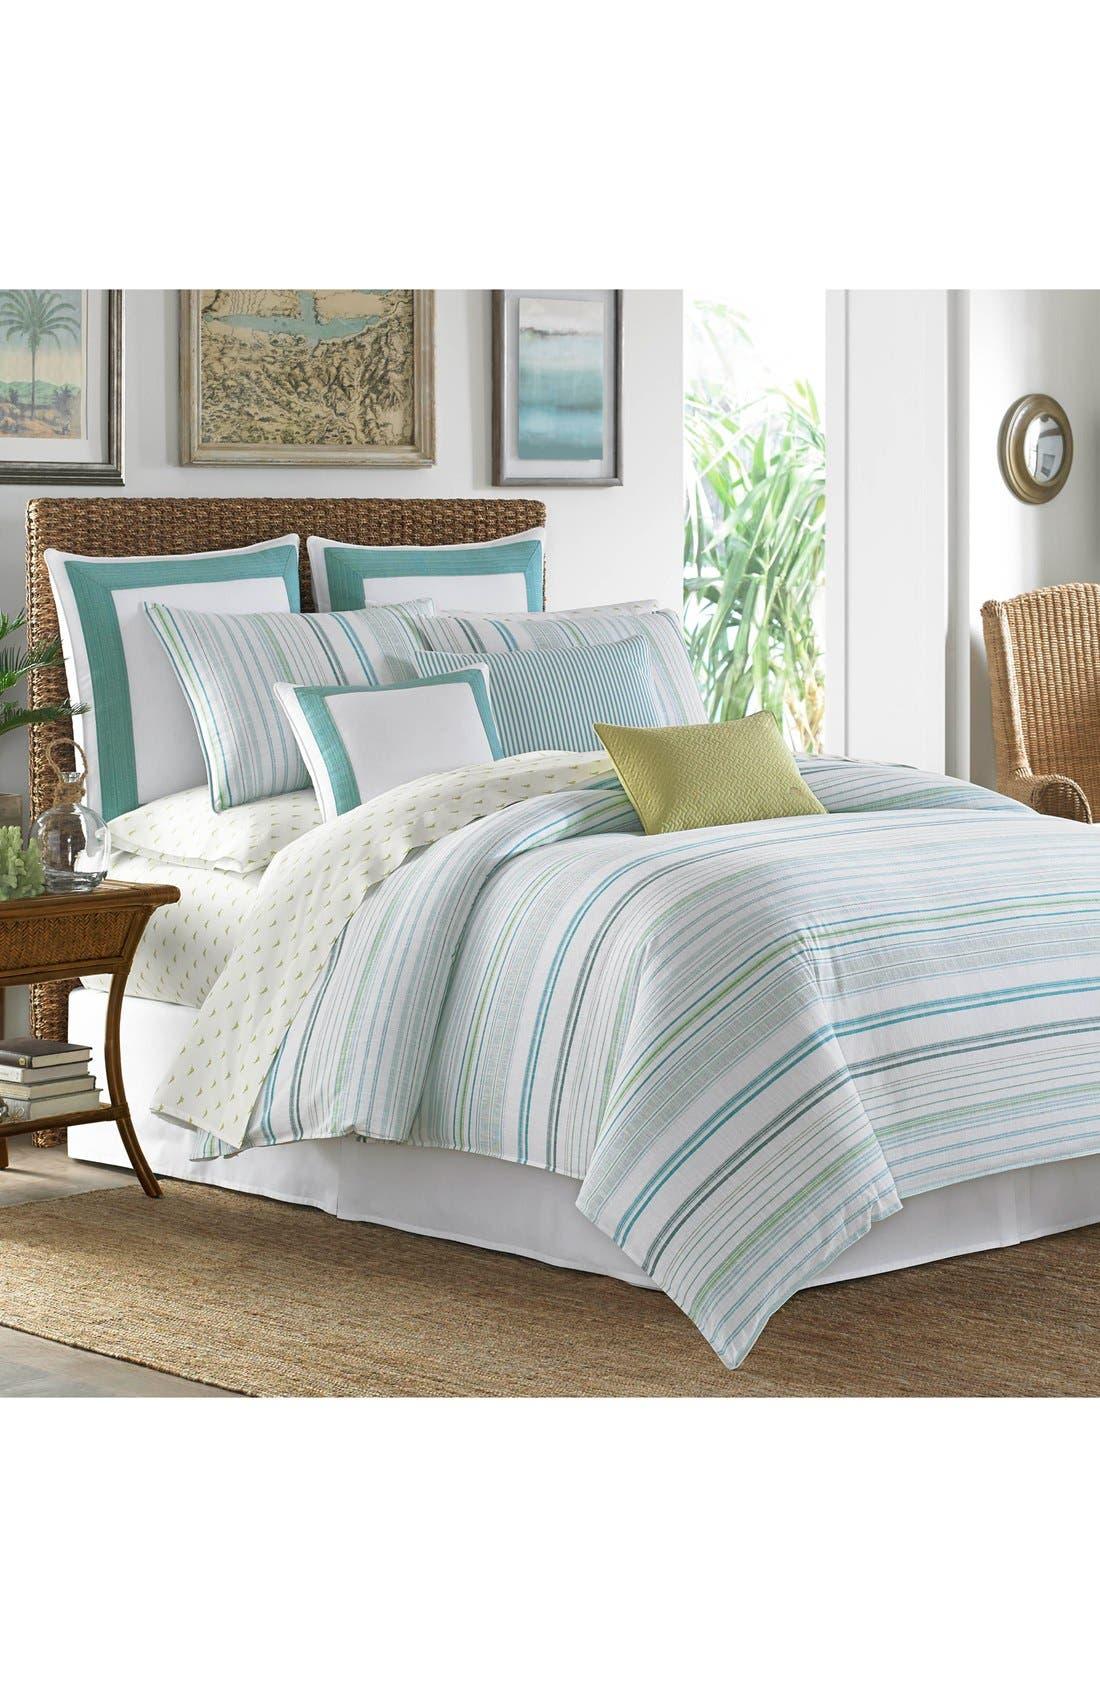 La Scala Breezer Comforter, Sham & Bed Skirt Set,                             Alternate thumbnail 2, color,                             Seaglass